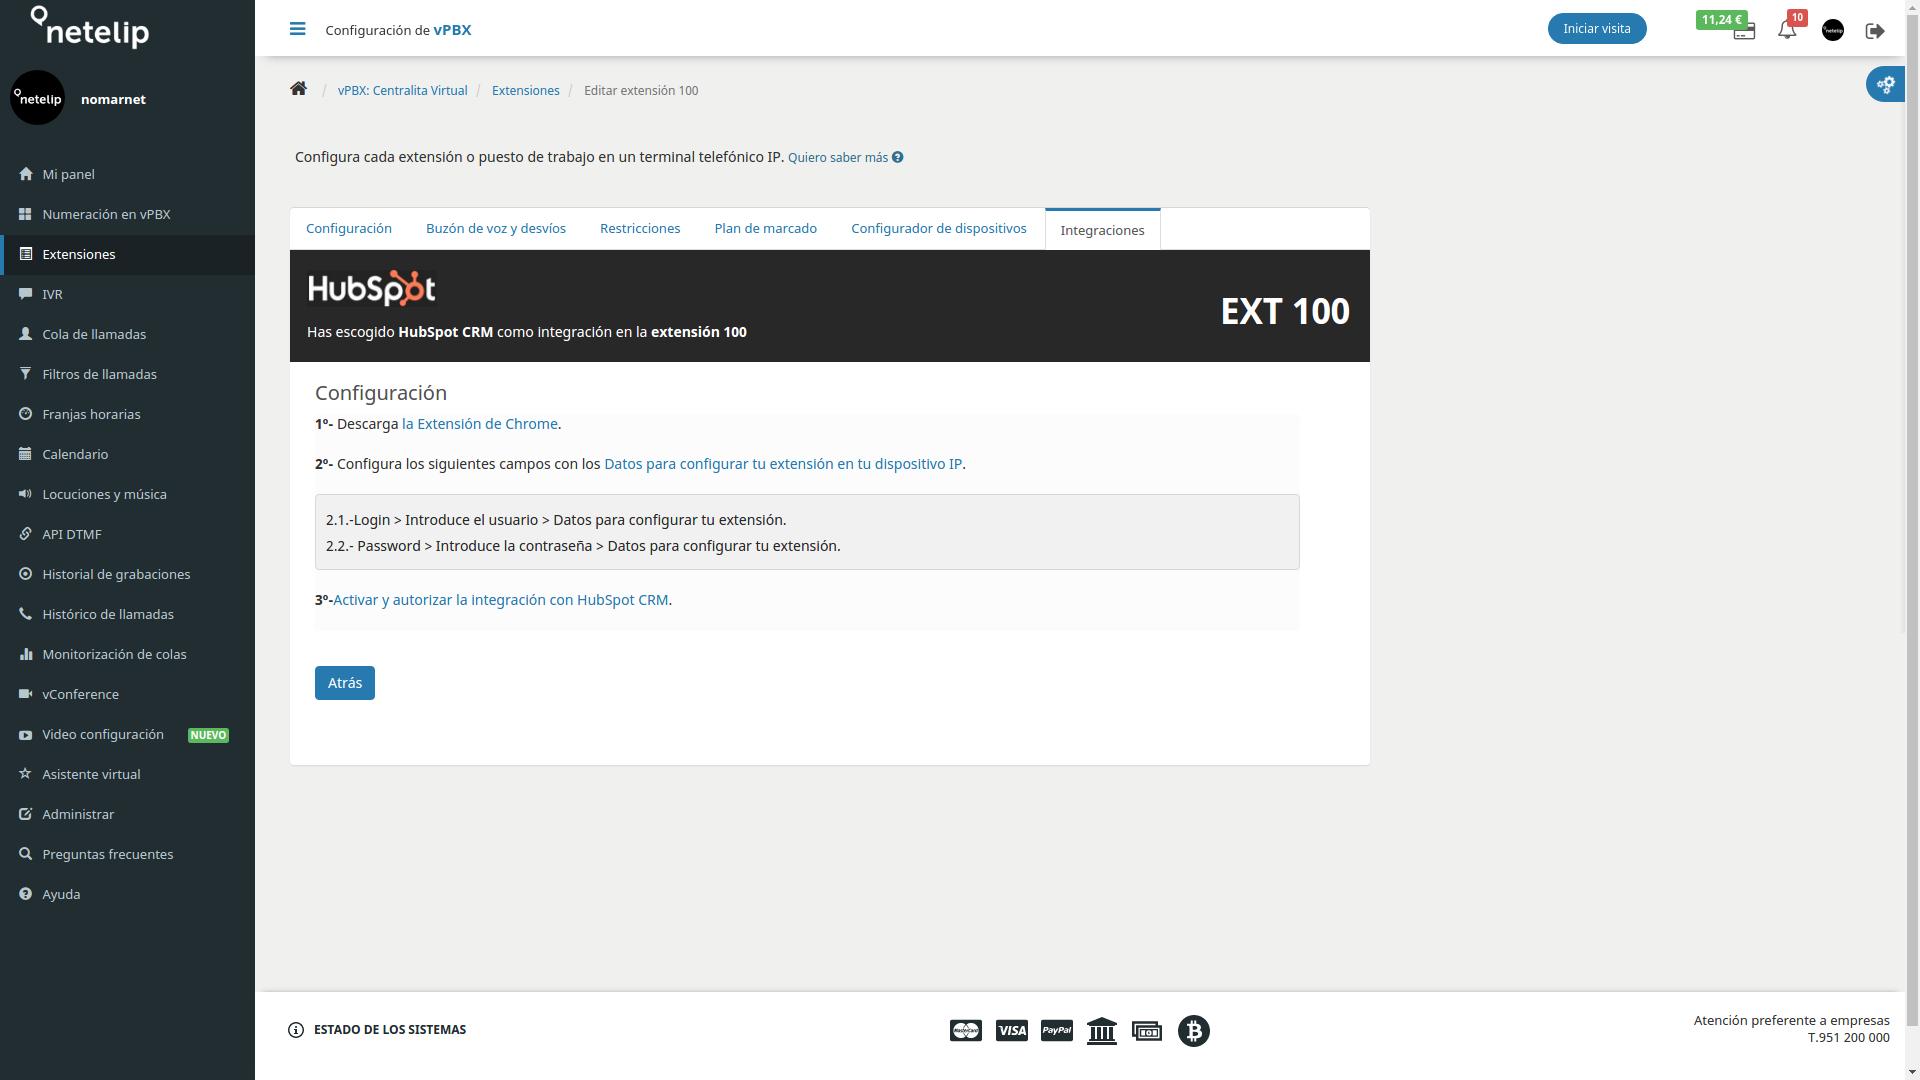 Integrar Hubspot con la Centralita Virtual de netelip